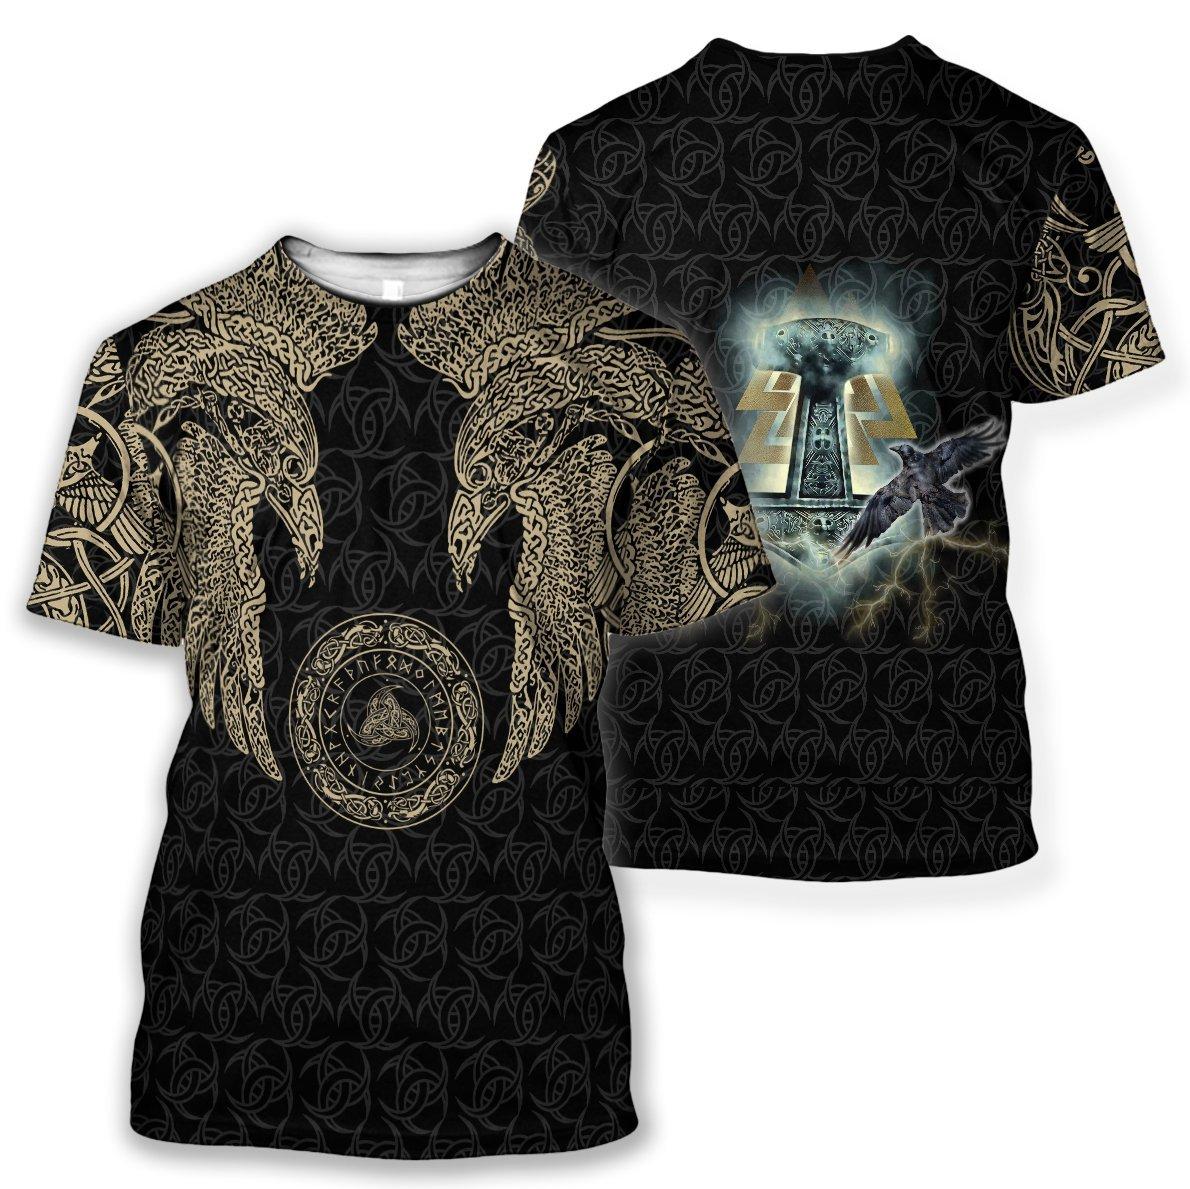 Odin's ravens viking all over printed tshirt